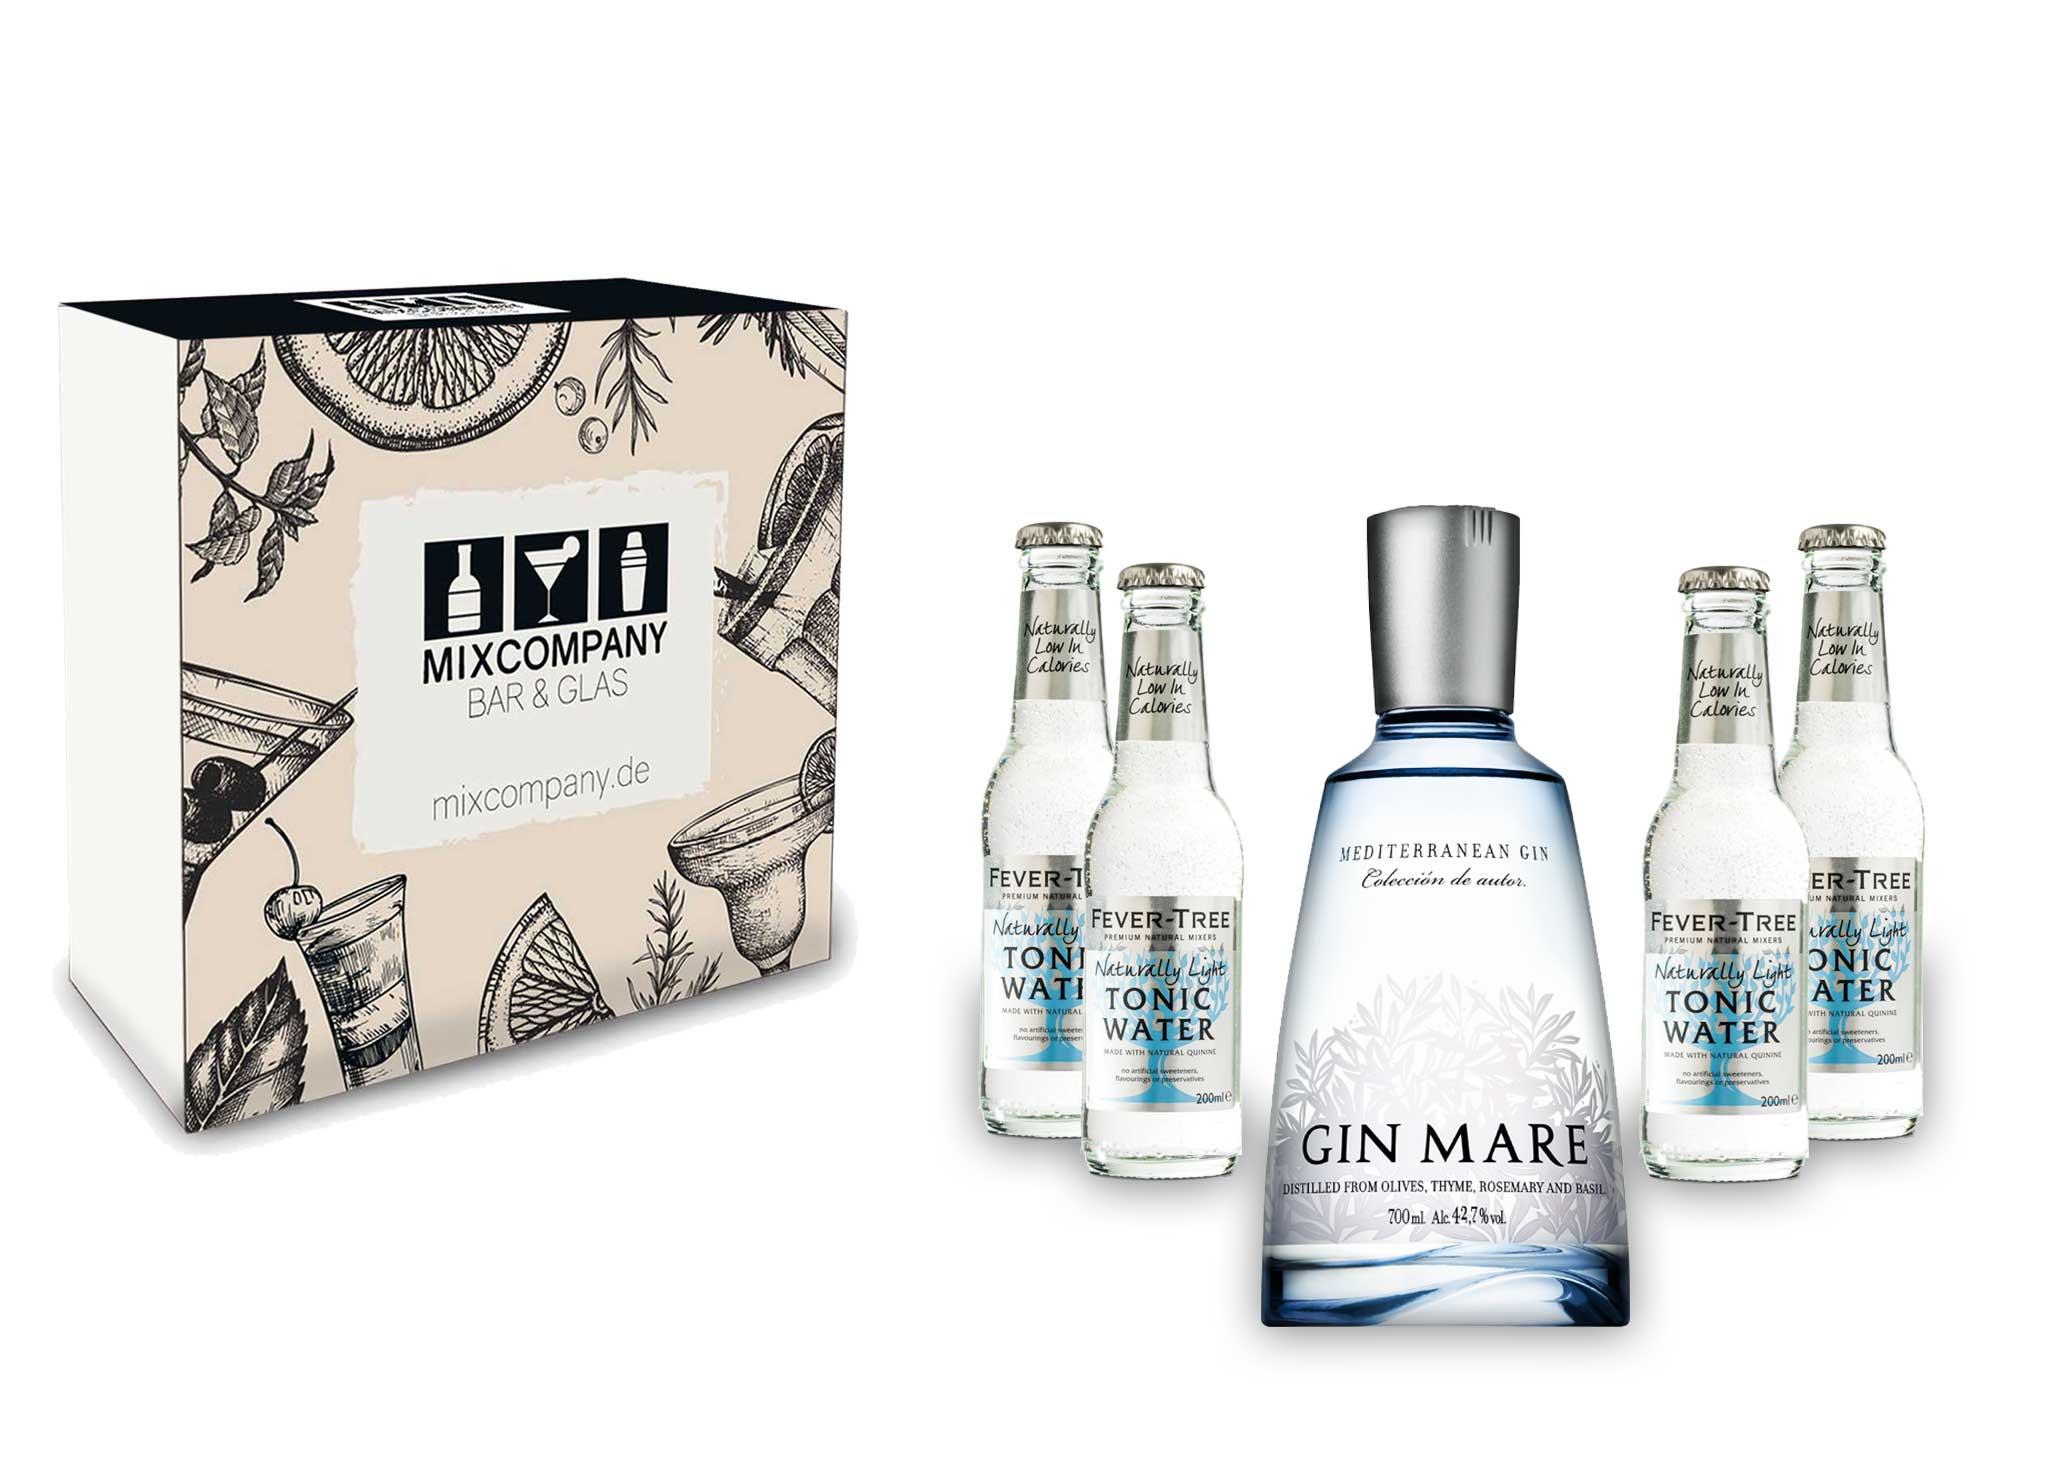 Gin Tonic Giftbox Geschenkset - Gin Mare 0,7l 700ml (42,7% Vol) + 4x Fever Tree Naturally Light Tonic Water 200ml inkl. Pfand MEHRWEG + Geschenkverpackung